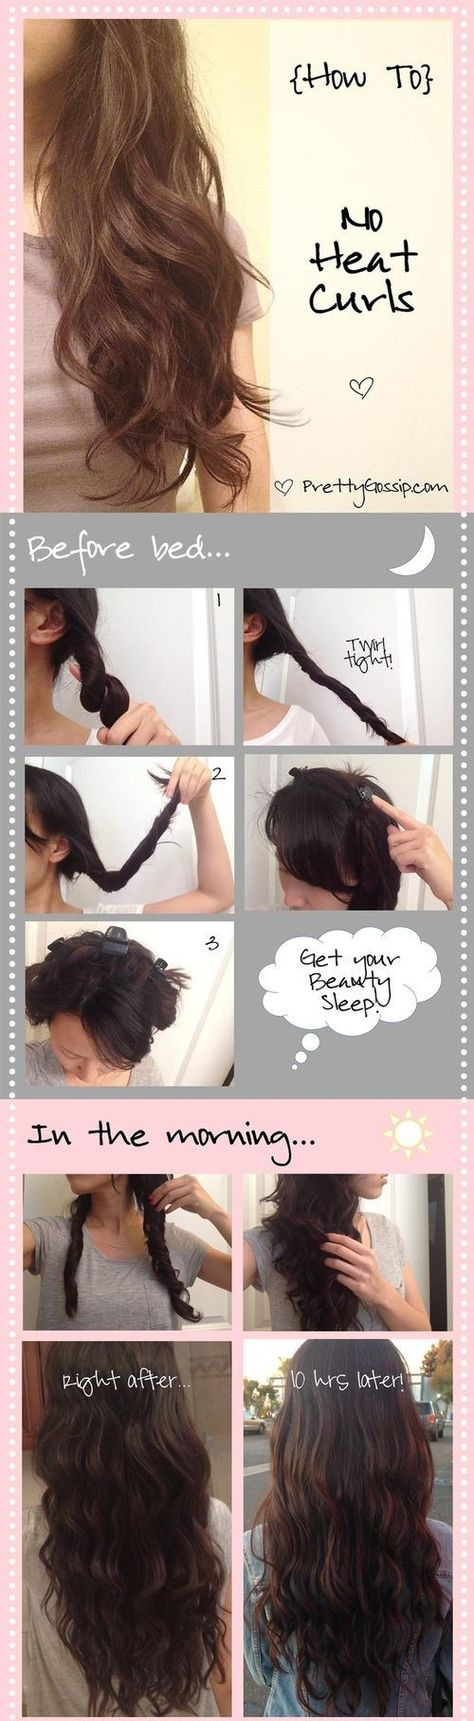 diy no heat curls tutorials tight curls natural waves and natural